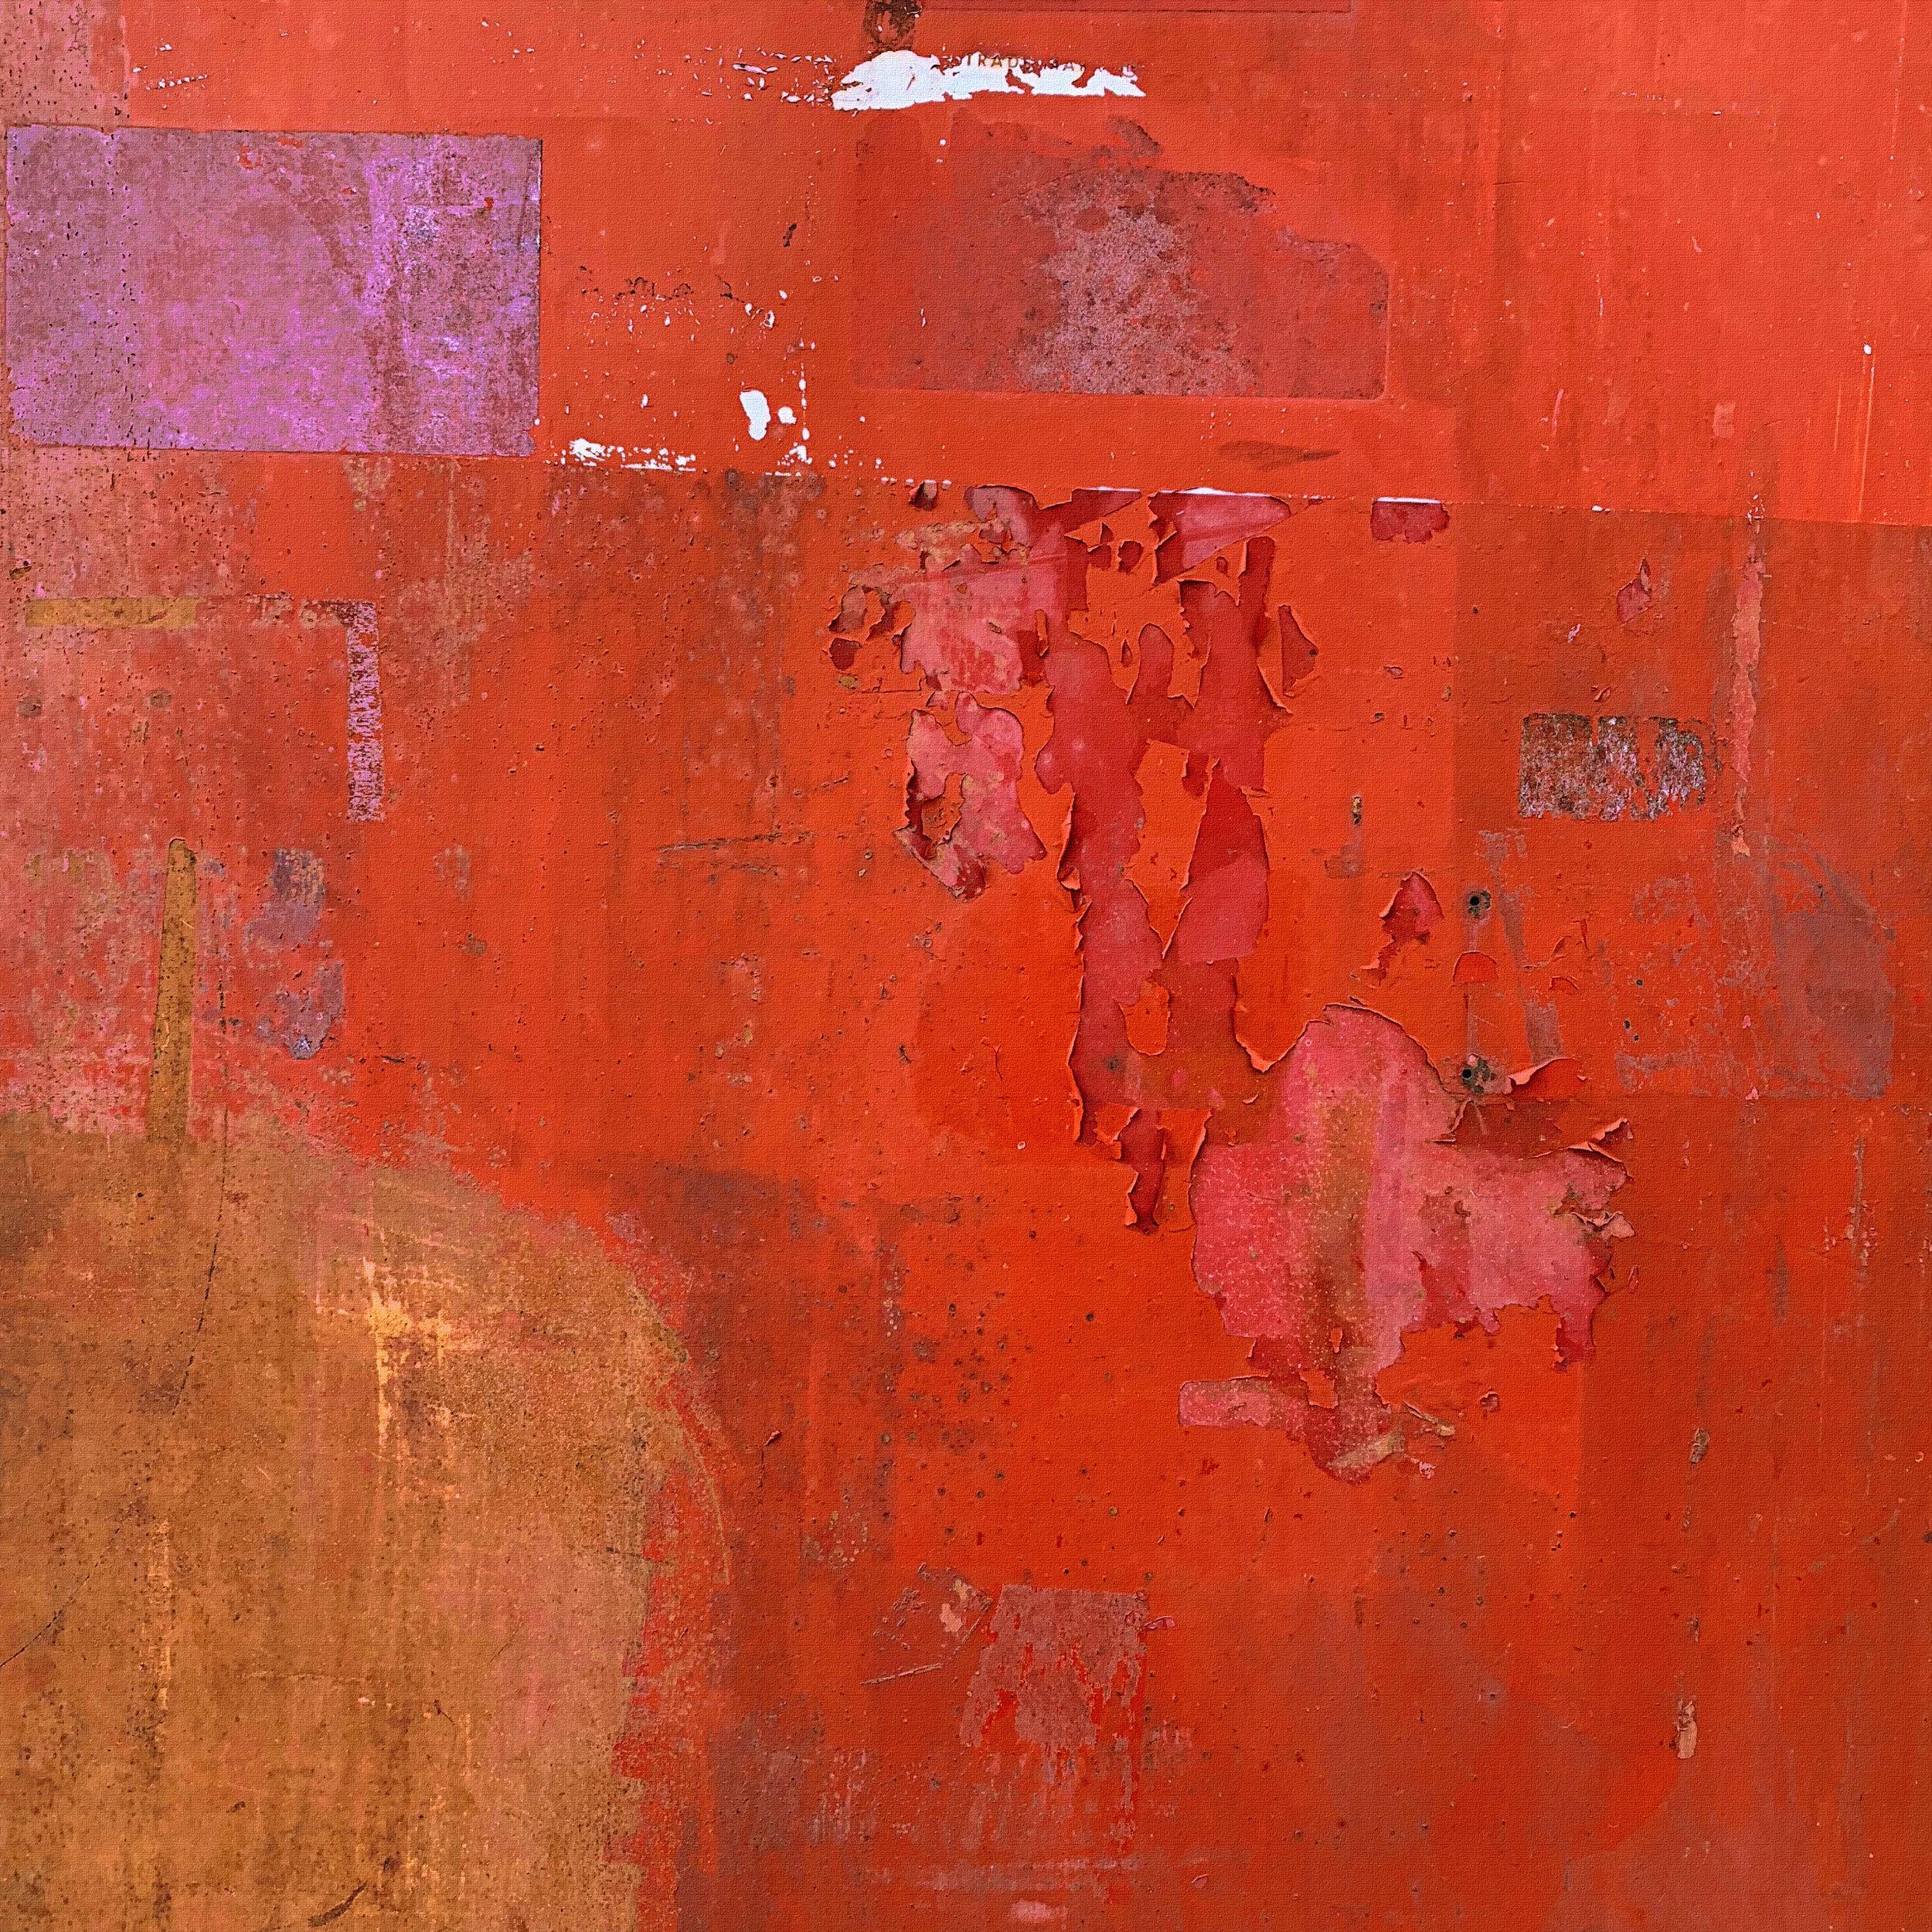 Urban Abstract IMG_1234 print edit.jpg